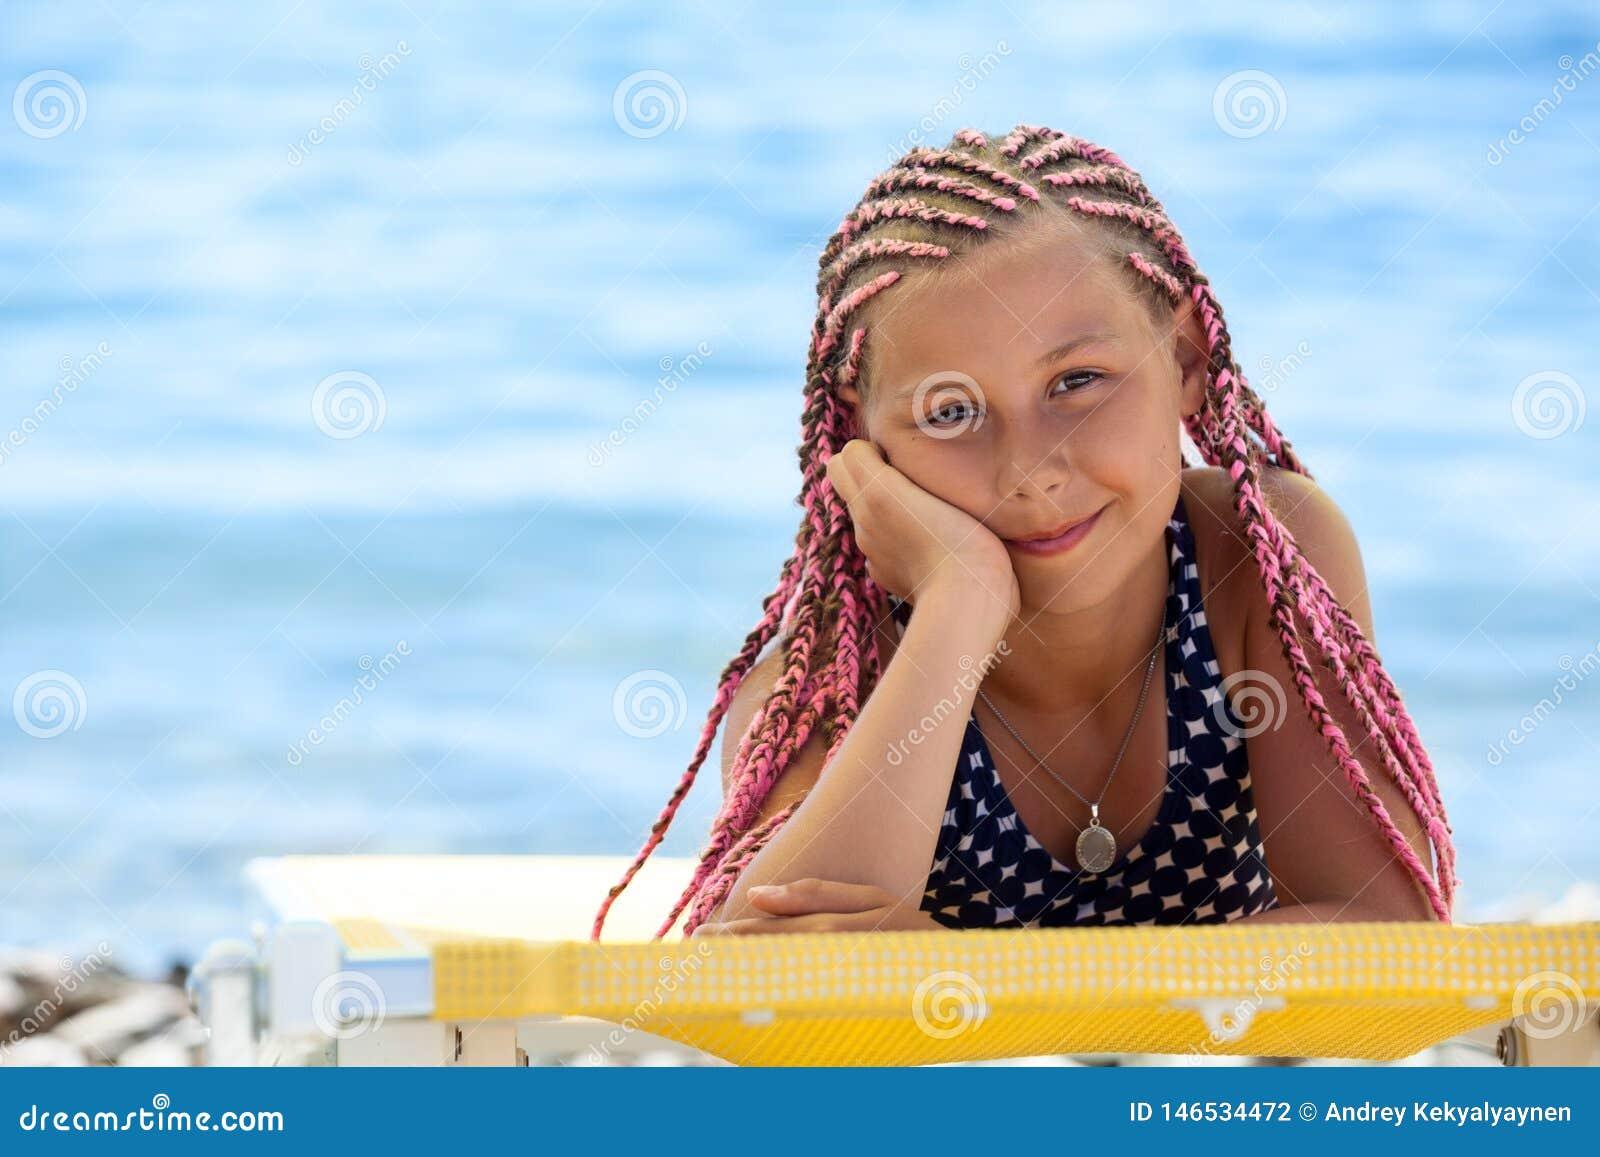 Retrato da menina preteen com penteado cor-de-rosa dos dreadlocks que bronzea-se na praia no seacoast